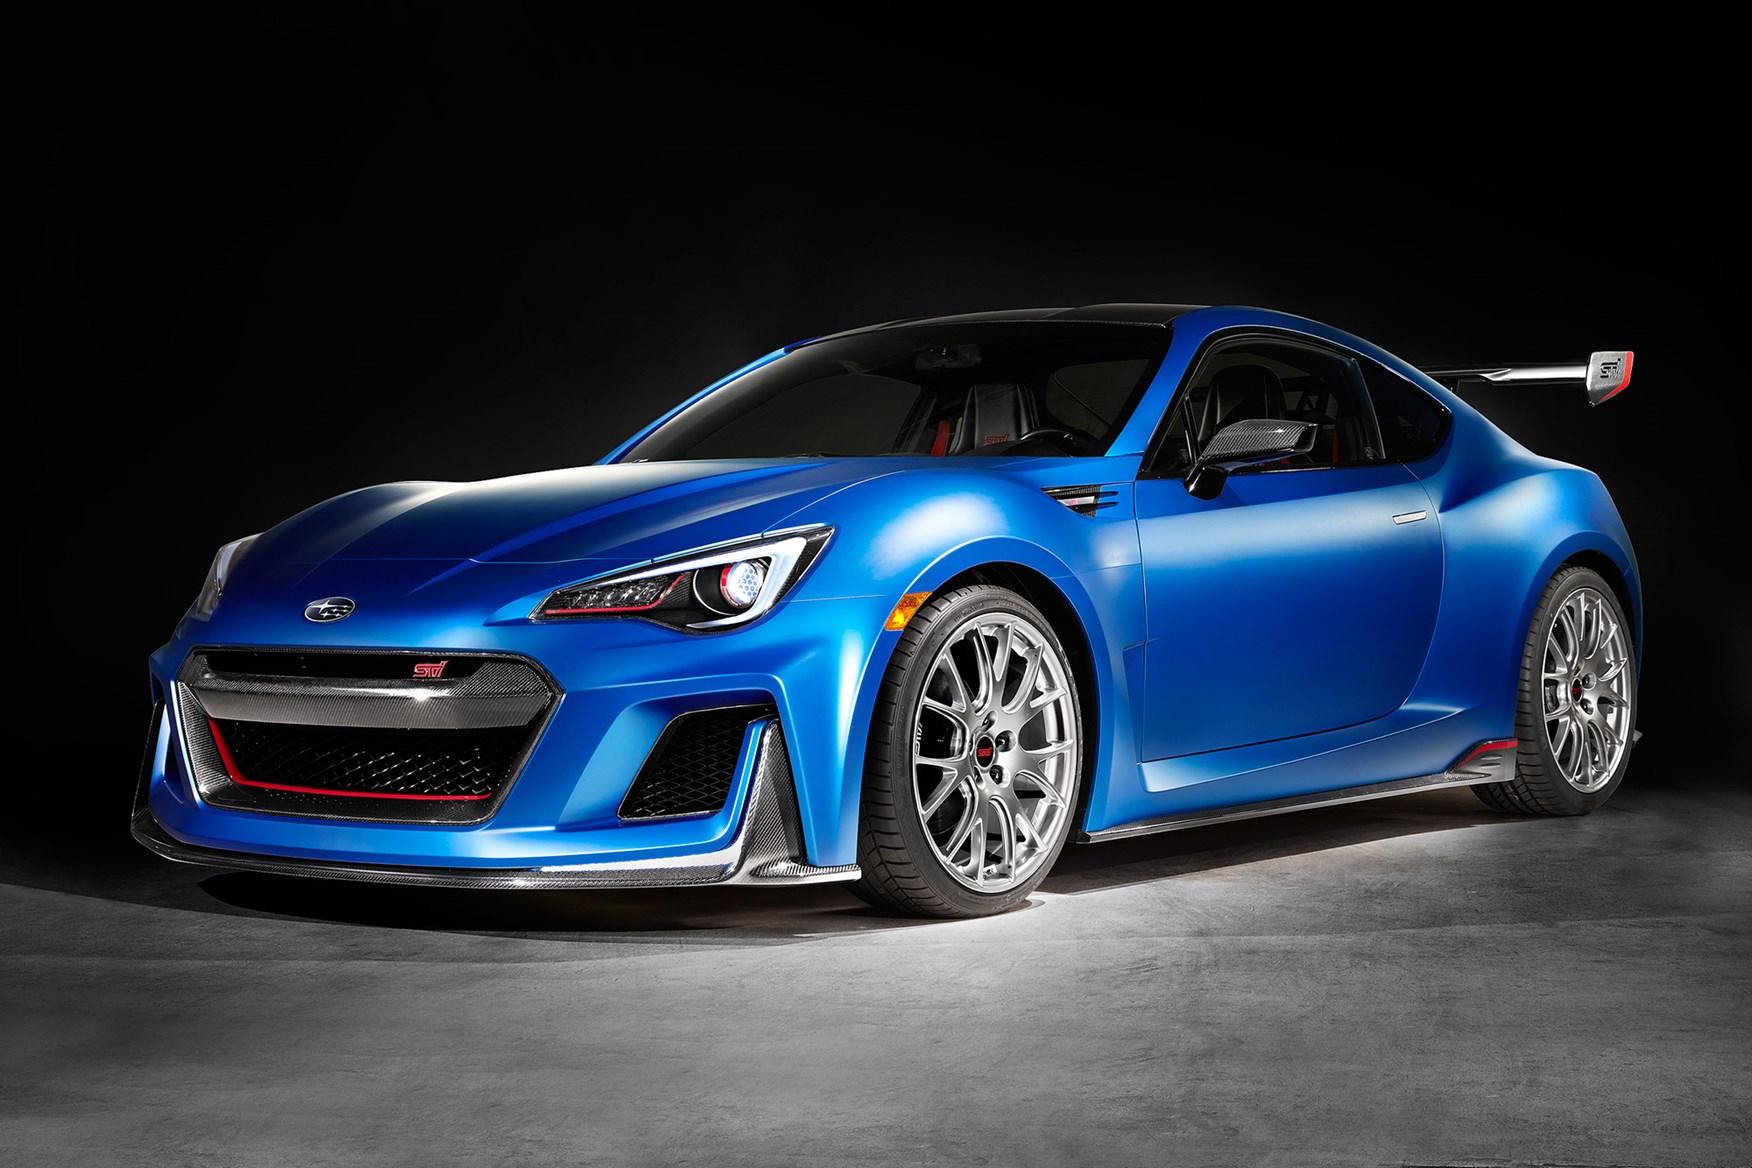 2015 Subaru BRZ STi concept